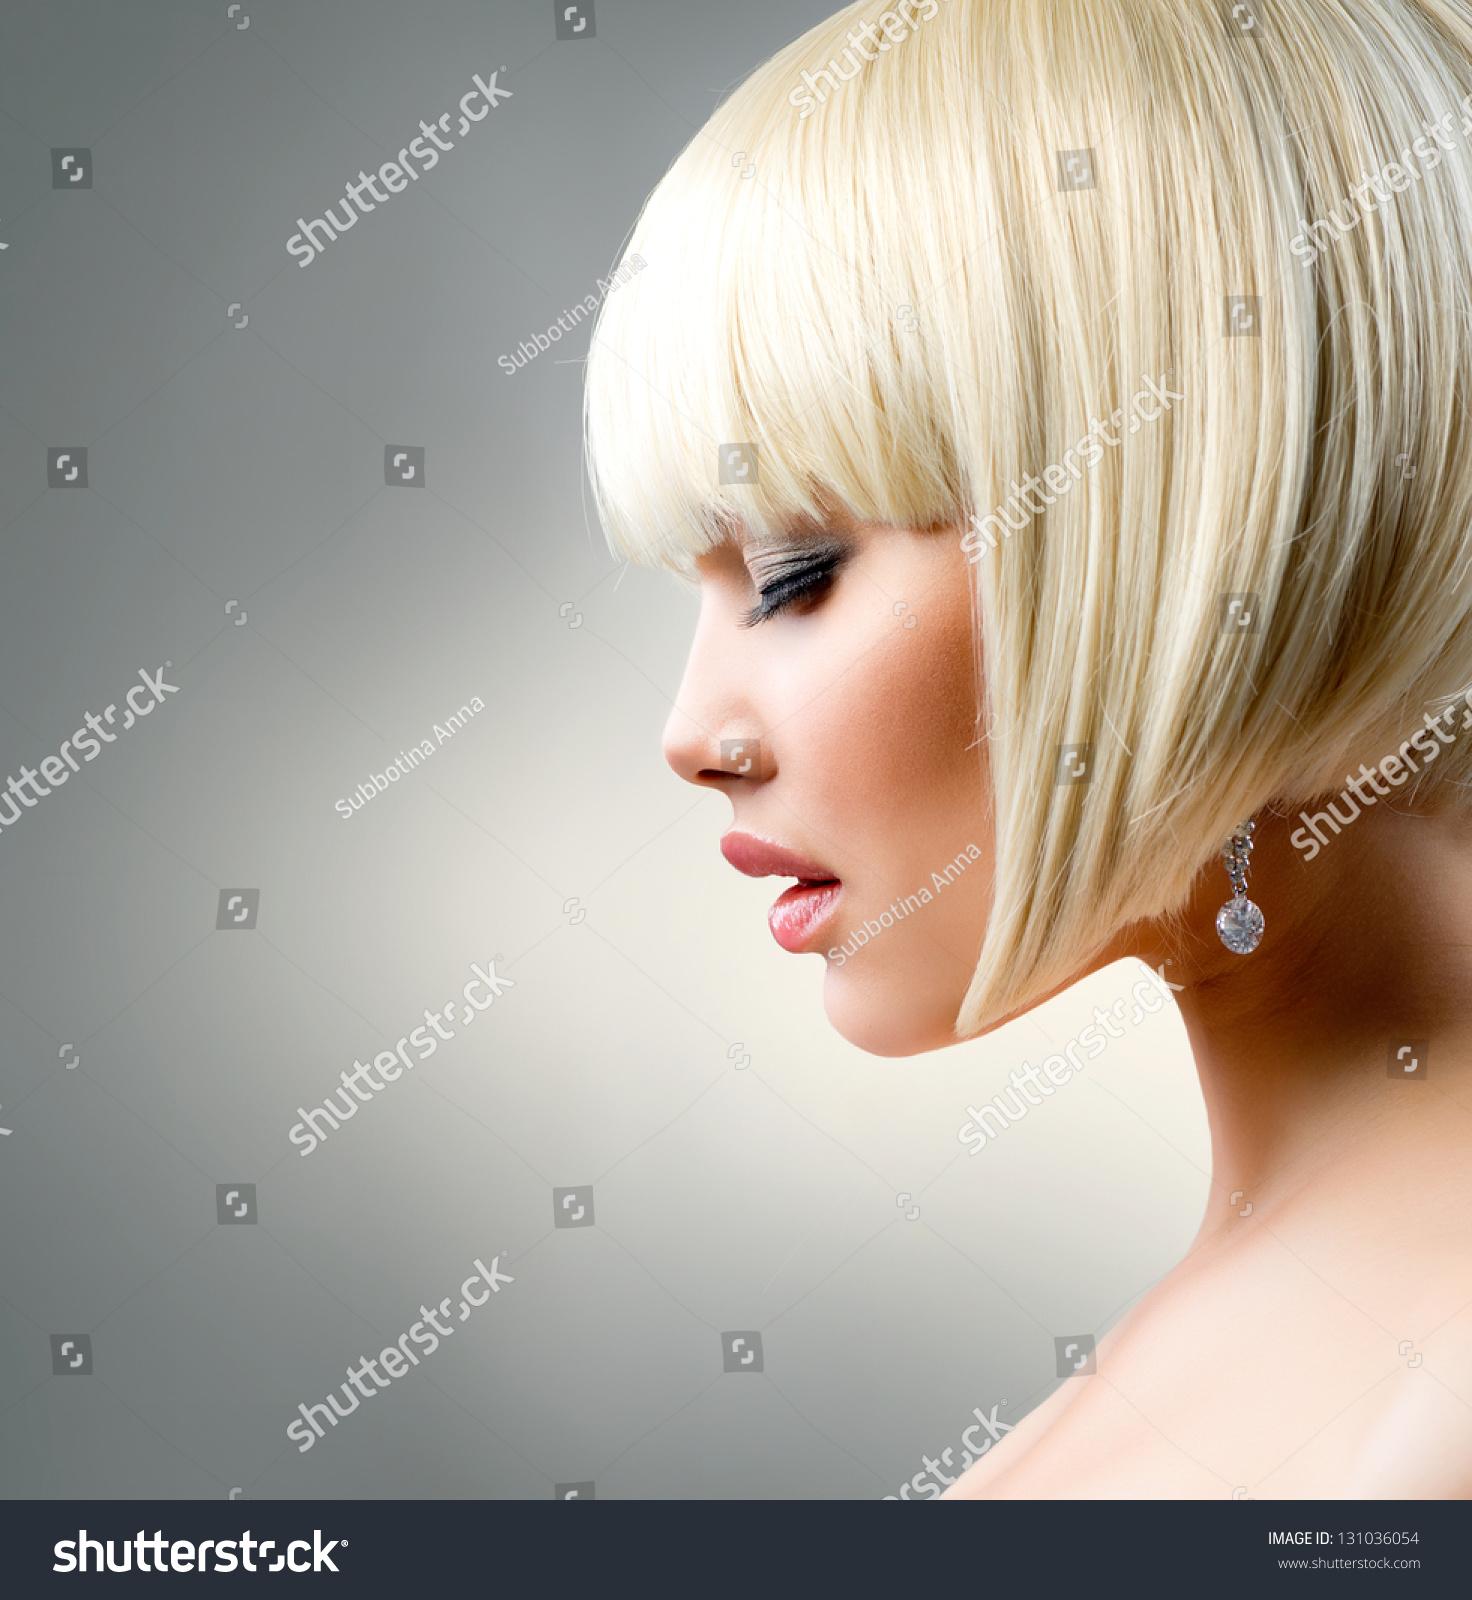 Blond Hair Haircut Beautiful Girl Healthy Stock Photo Edit Now